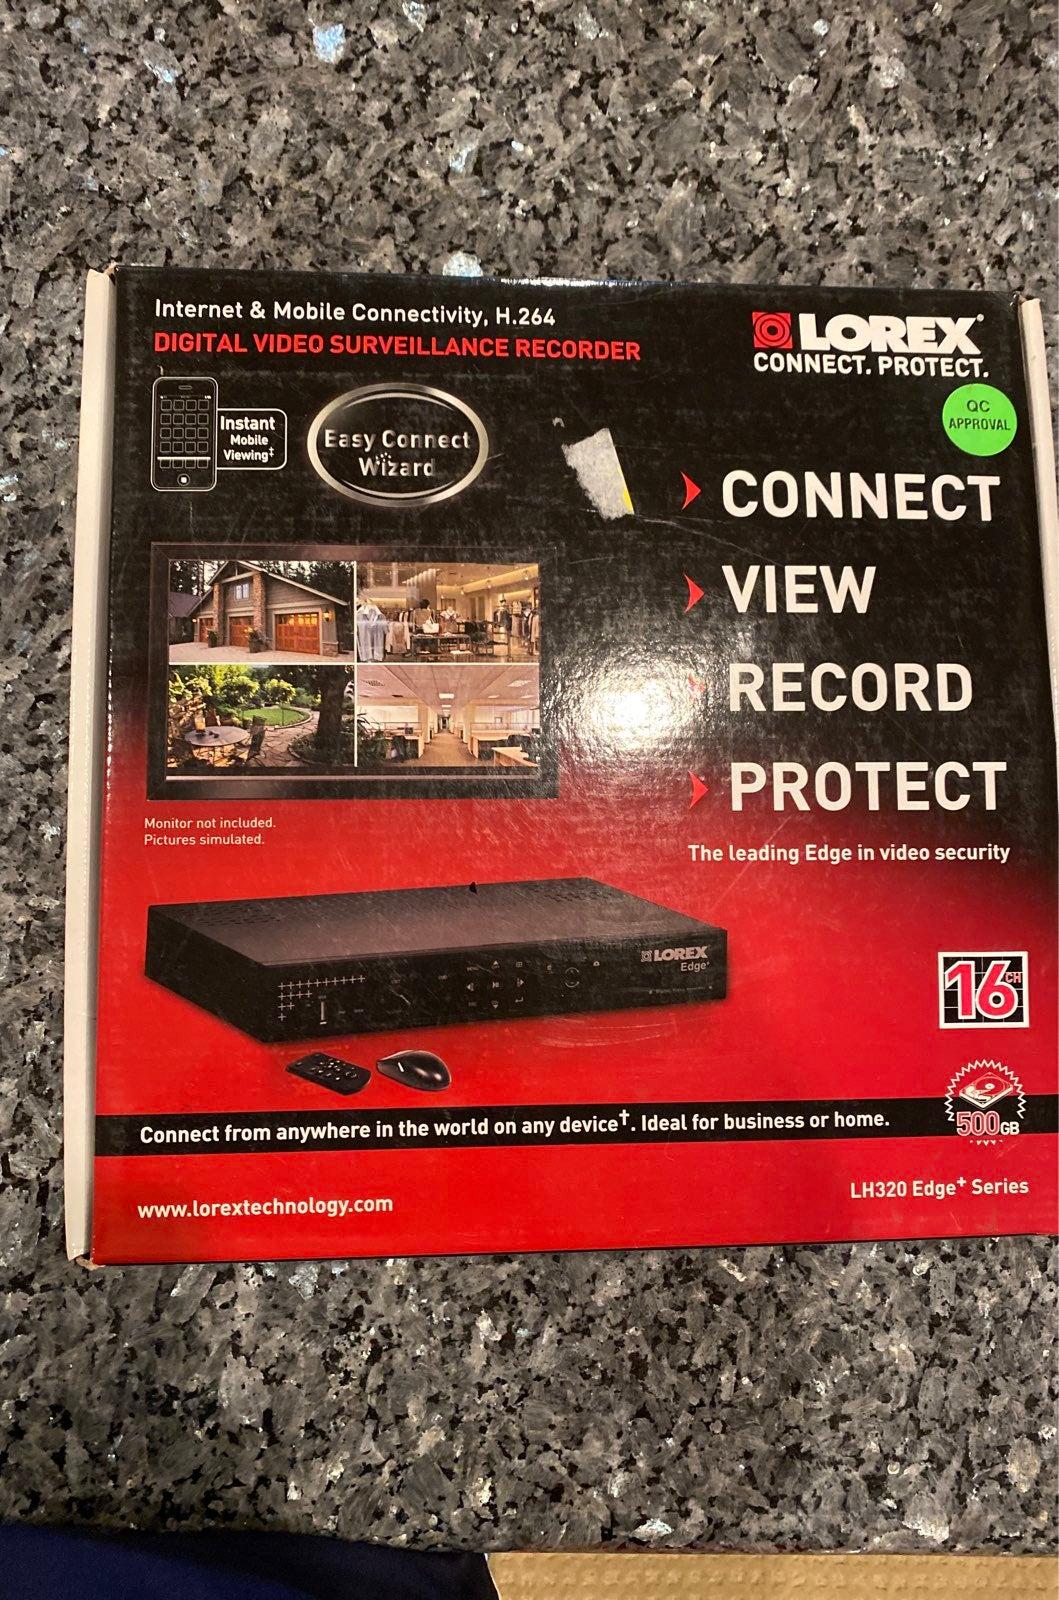 Digital Video Surveillance Recorder